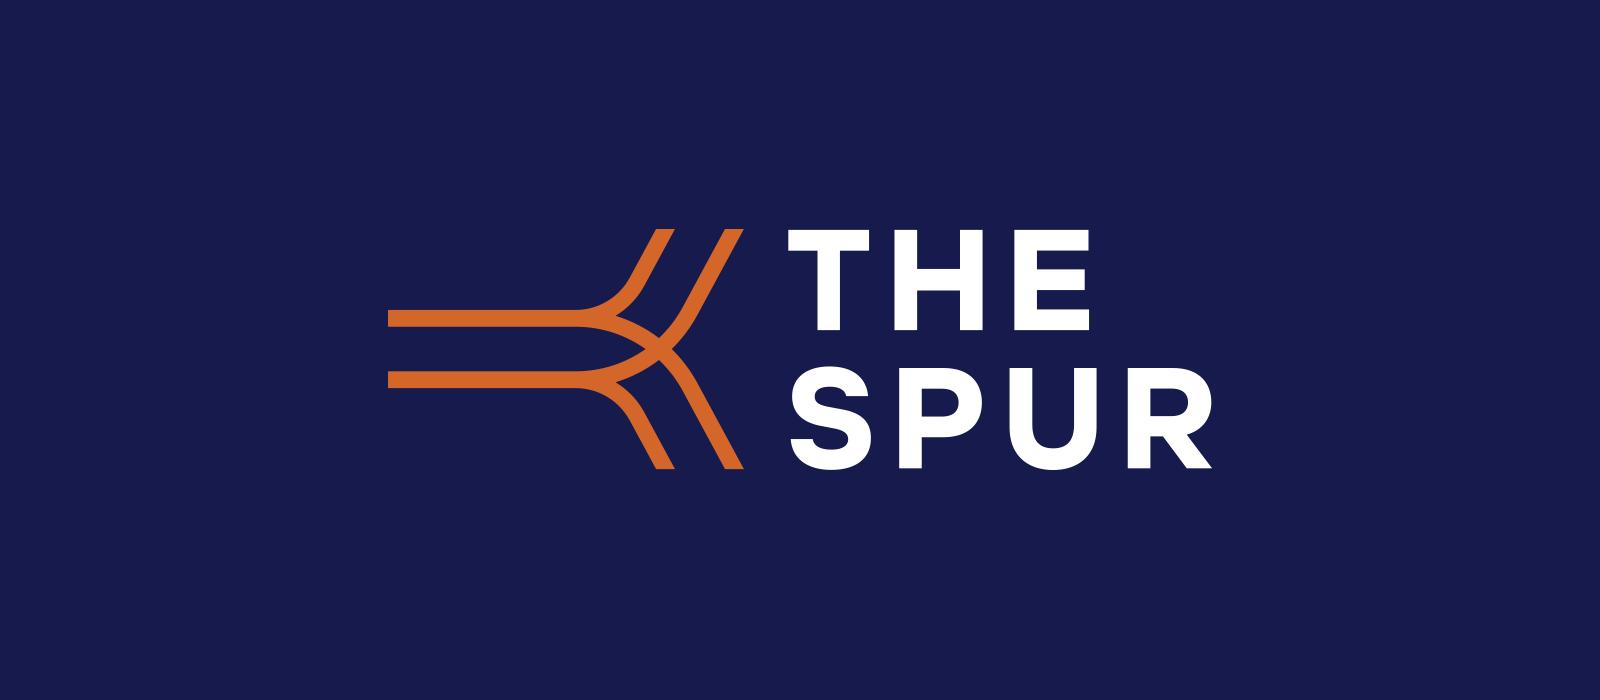 the-spur-logo-hero